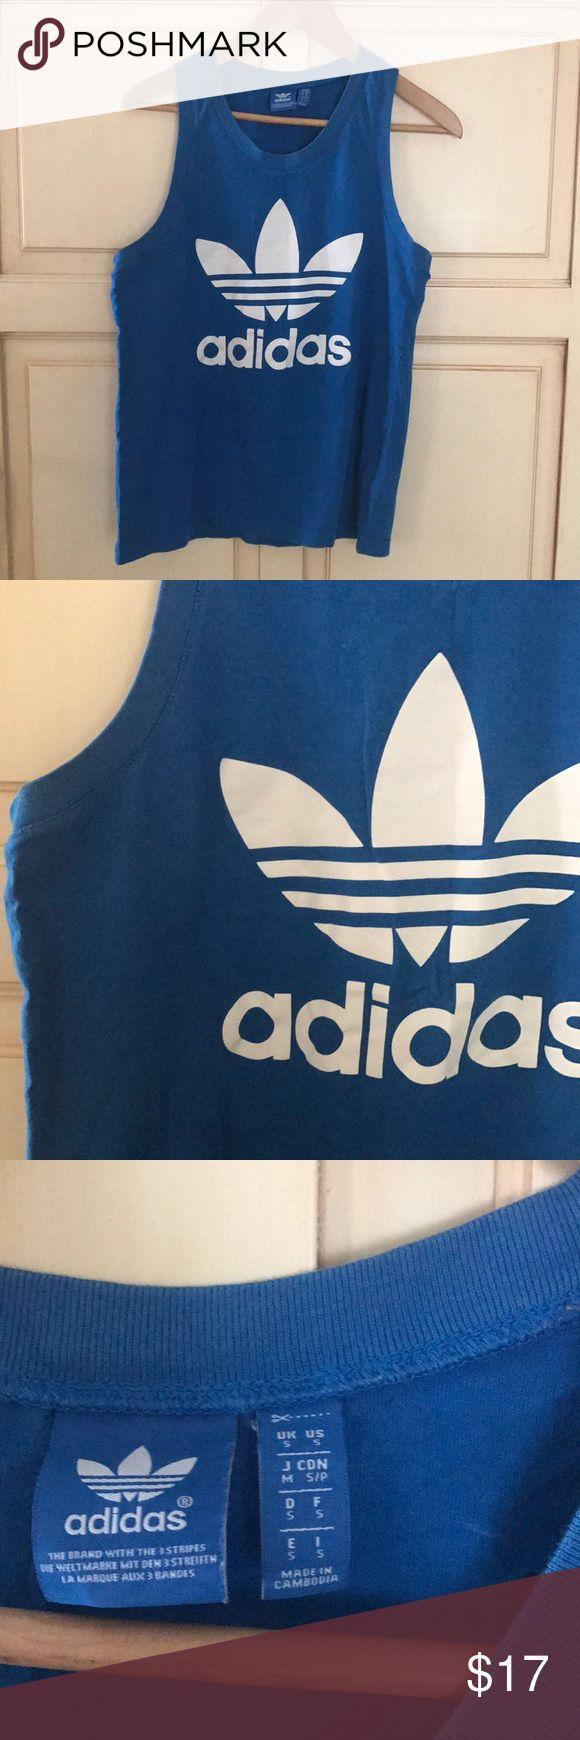 Adidas workout tank Adidas original workout tank - men's small. Make an offer :) adidas Tops Tank Tops